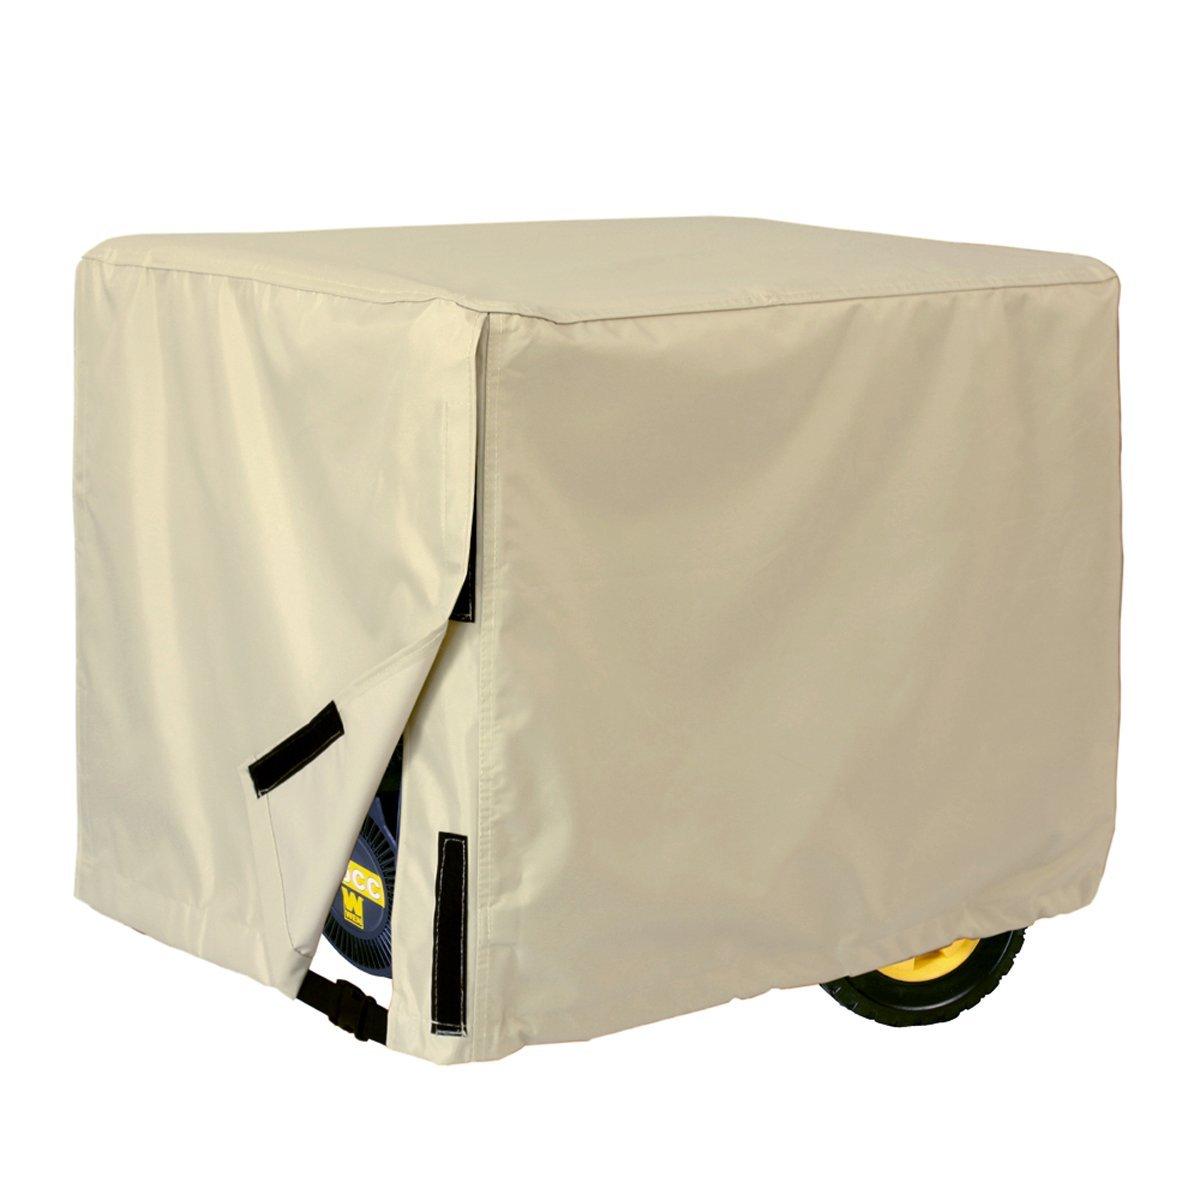 Porch Shield 100% Waterproof Universal Generator Cover (Fits generators up to 66 x 50.8 x 50.8 cm, Light Tan) 10604001